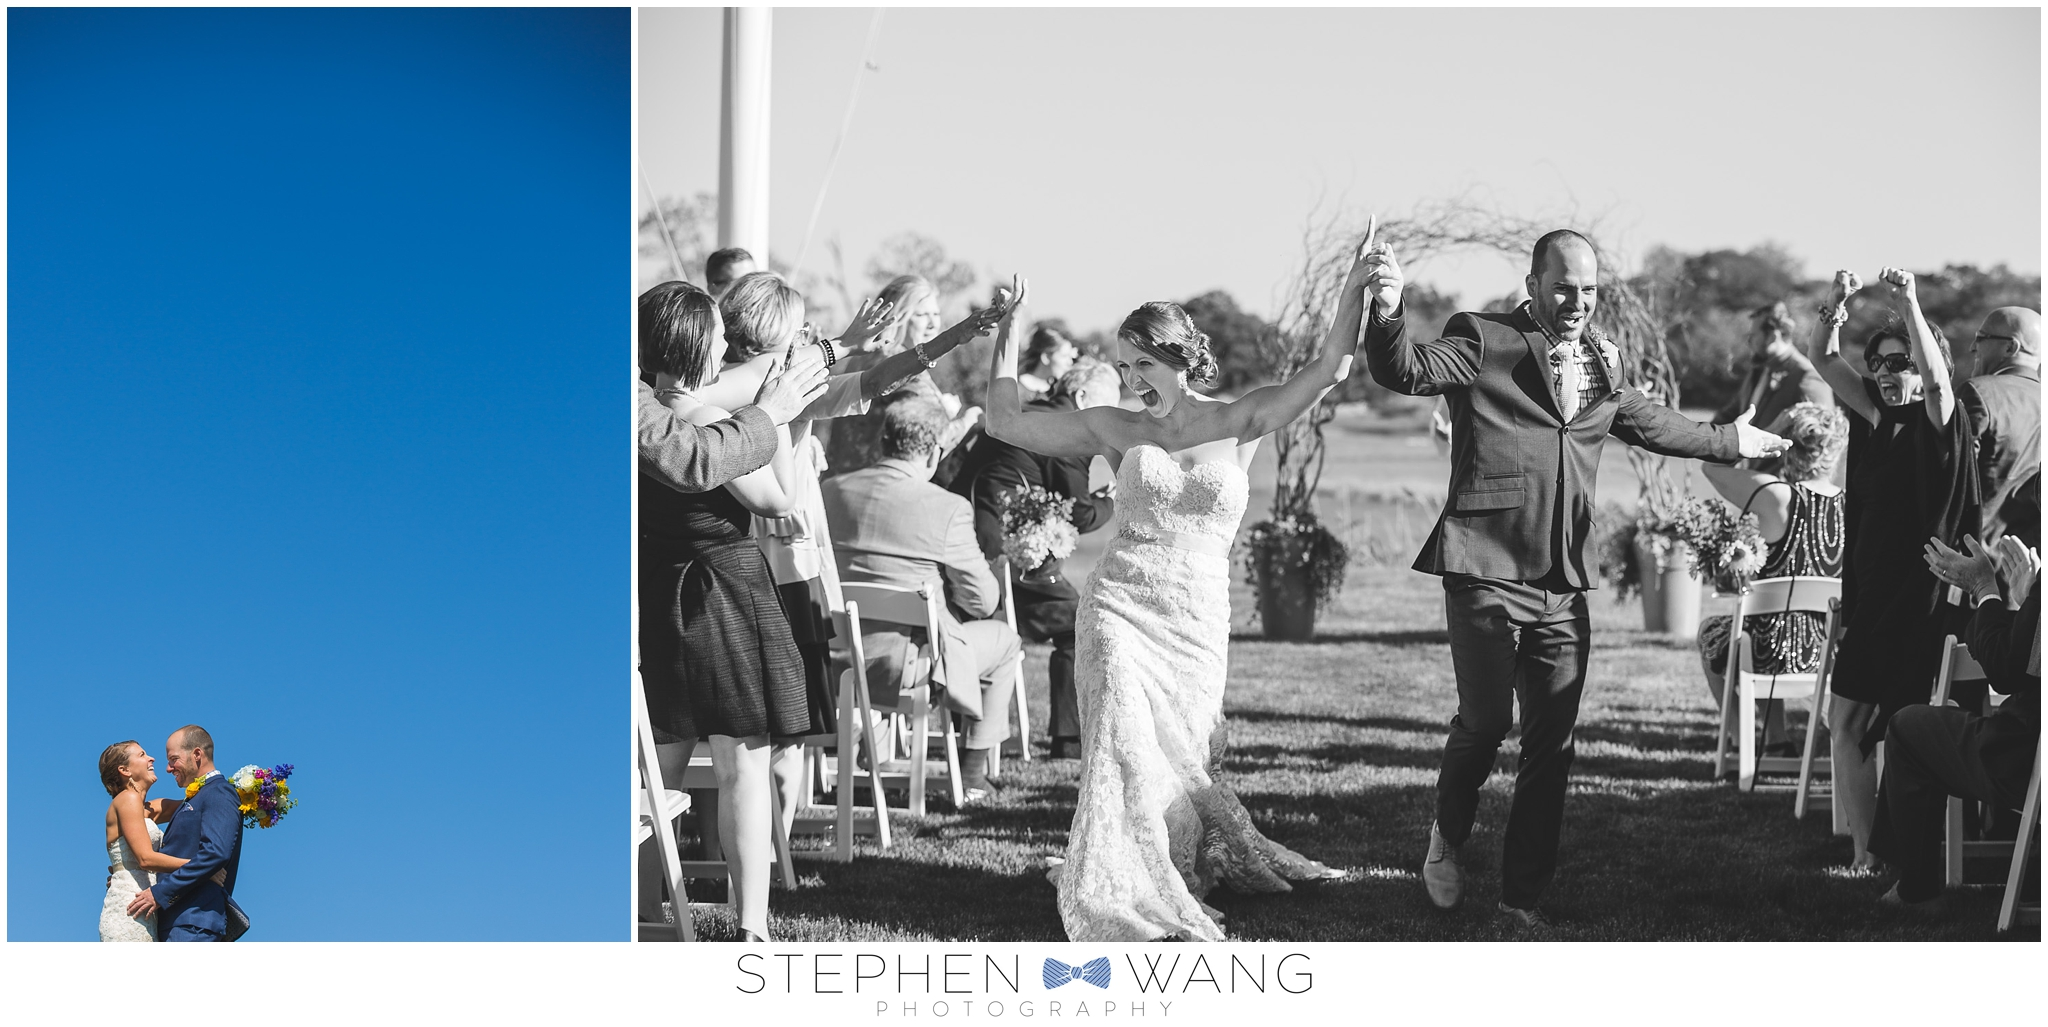 Stephen Wang Photography Wedding Photographer Connecticut CT-12-24_0011.jpg